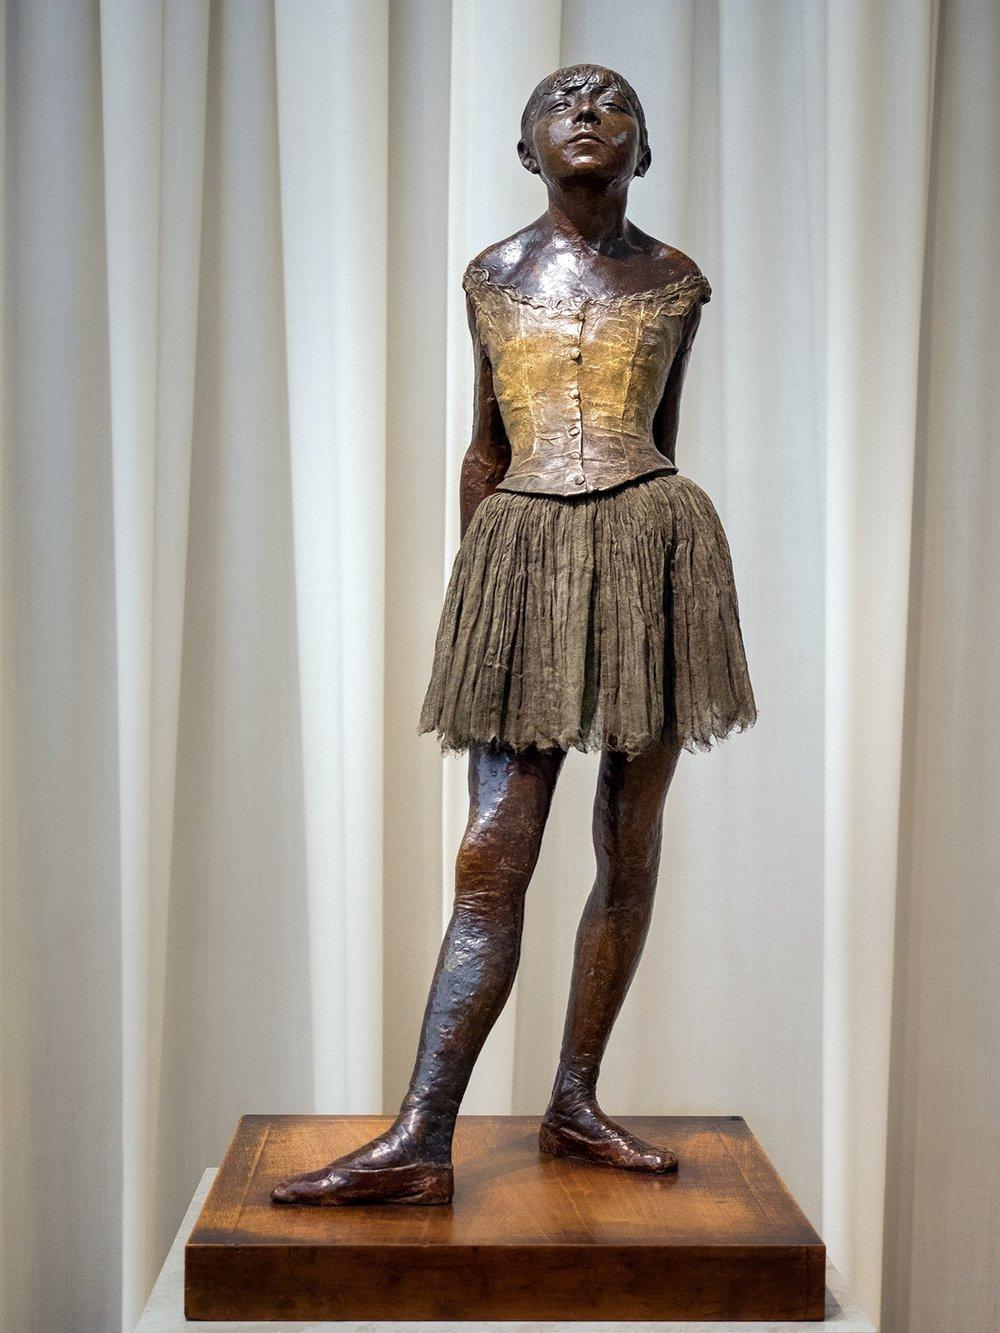 1+Little+Dancer+Aged+Fourteen%2C+by+Edgar+Degas+Photo+%C2%A9+Chris+Costello3.jpg